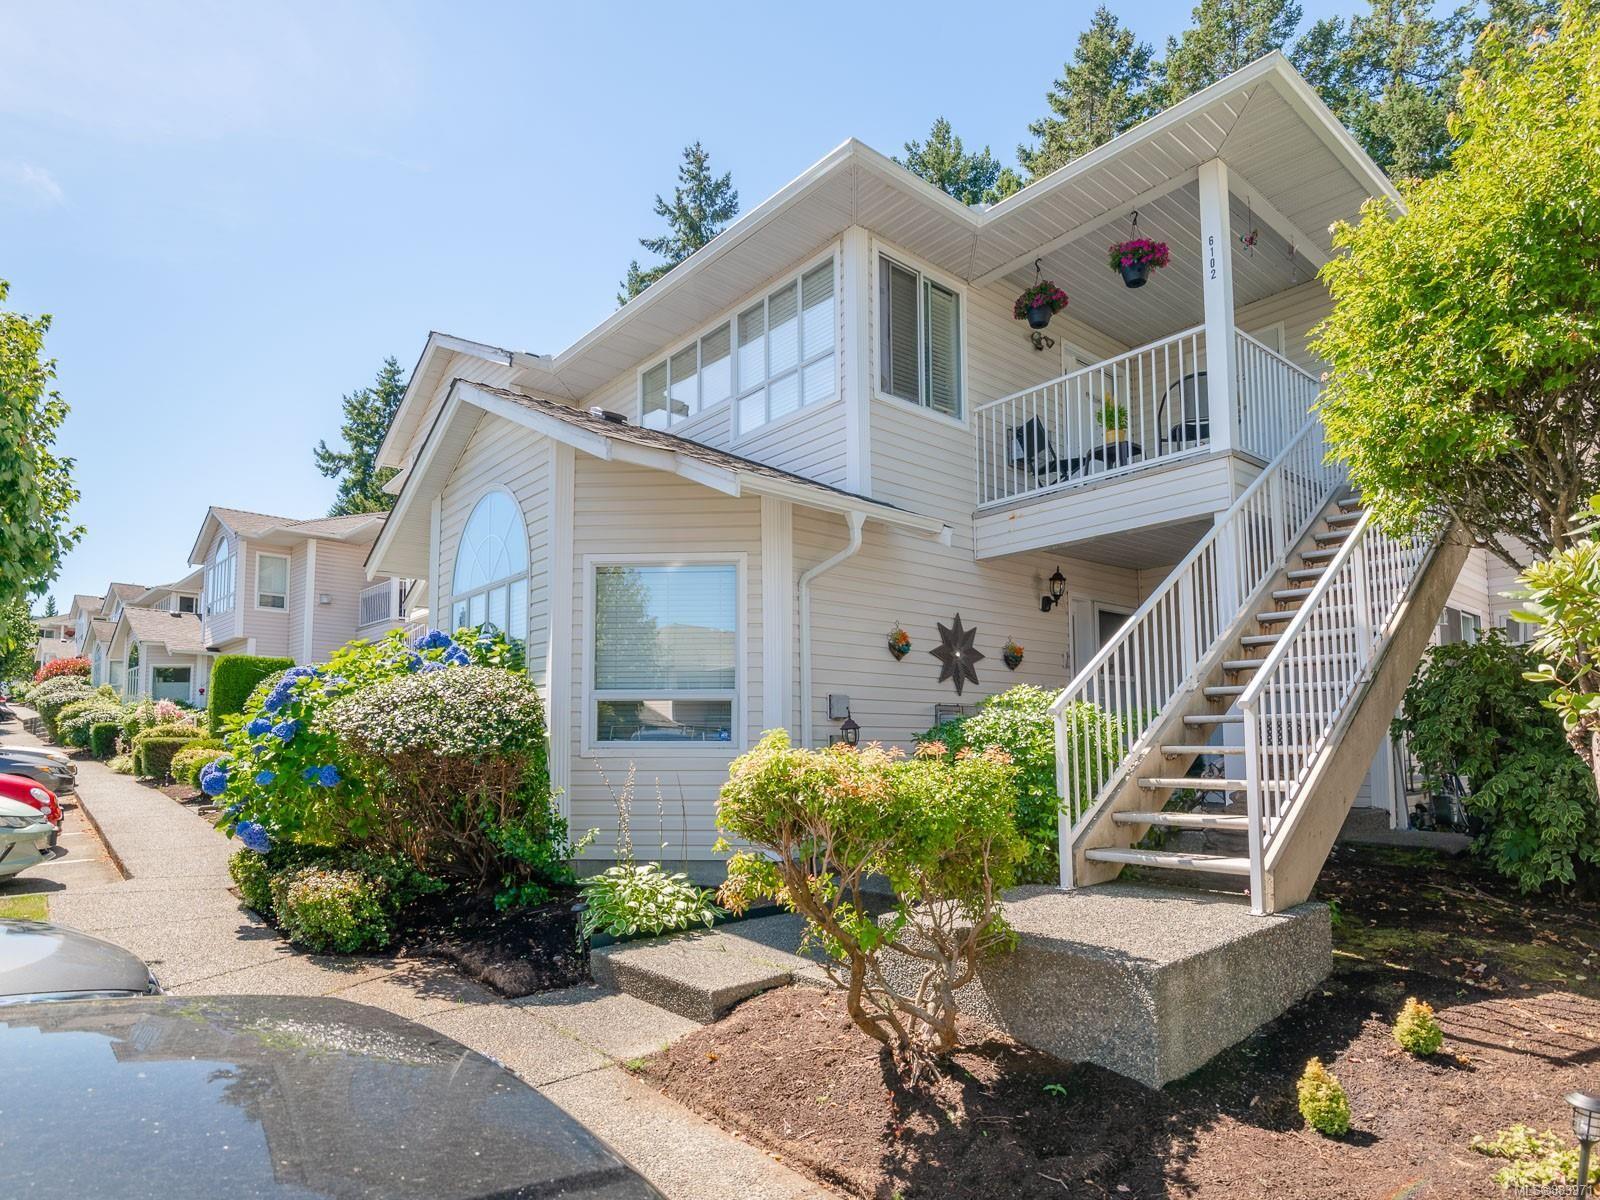 Main Photo: 6102 Cedar Grove Dr in : Na North Nanaimo Row/Townhouse for sale (Nanaimo)  : MLS®# 883971